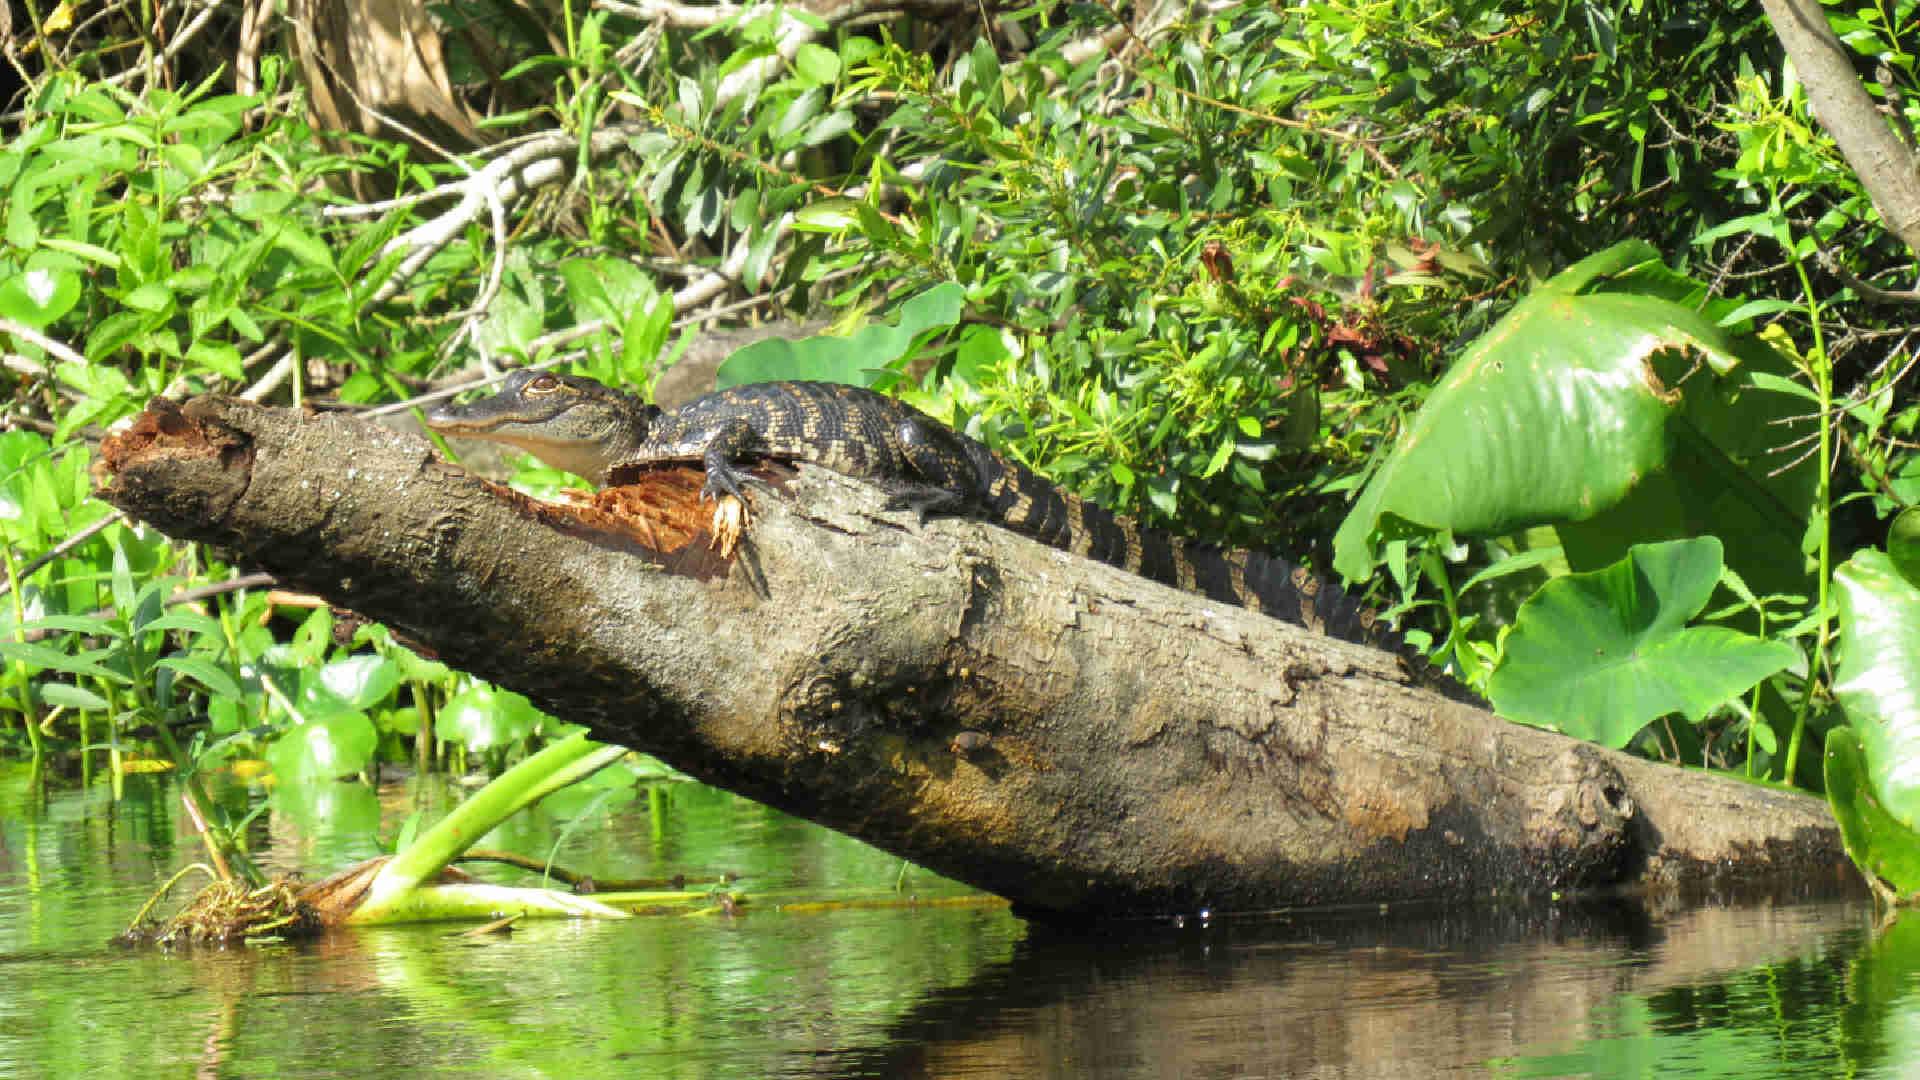 A cute baby alligator sunning on a log.